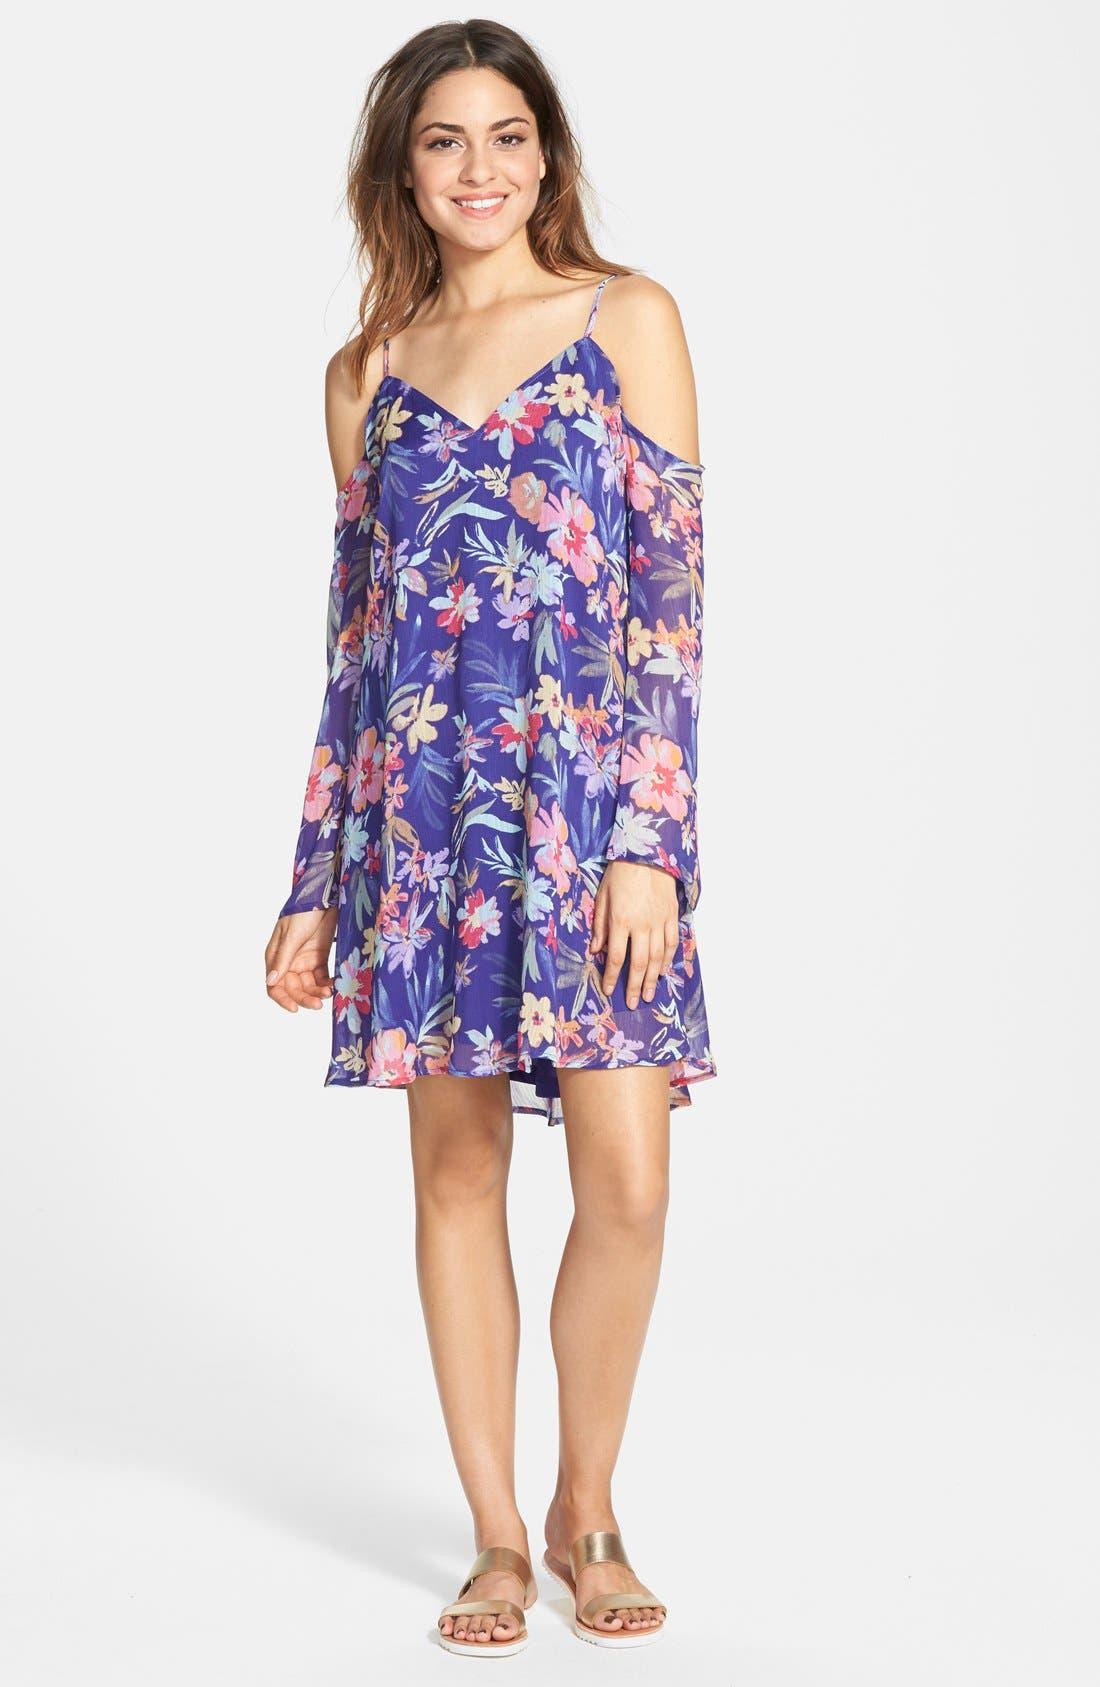 Alternate Image 1 Selected - Fire Floral Print Chiffon Cold Shoulder Dress (Juniors)